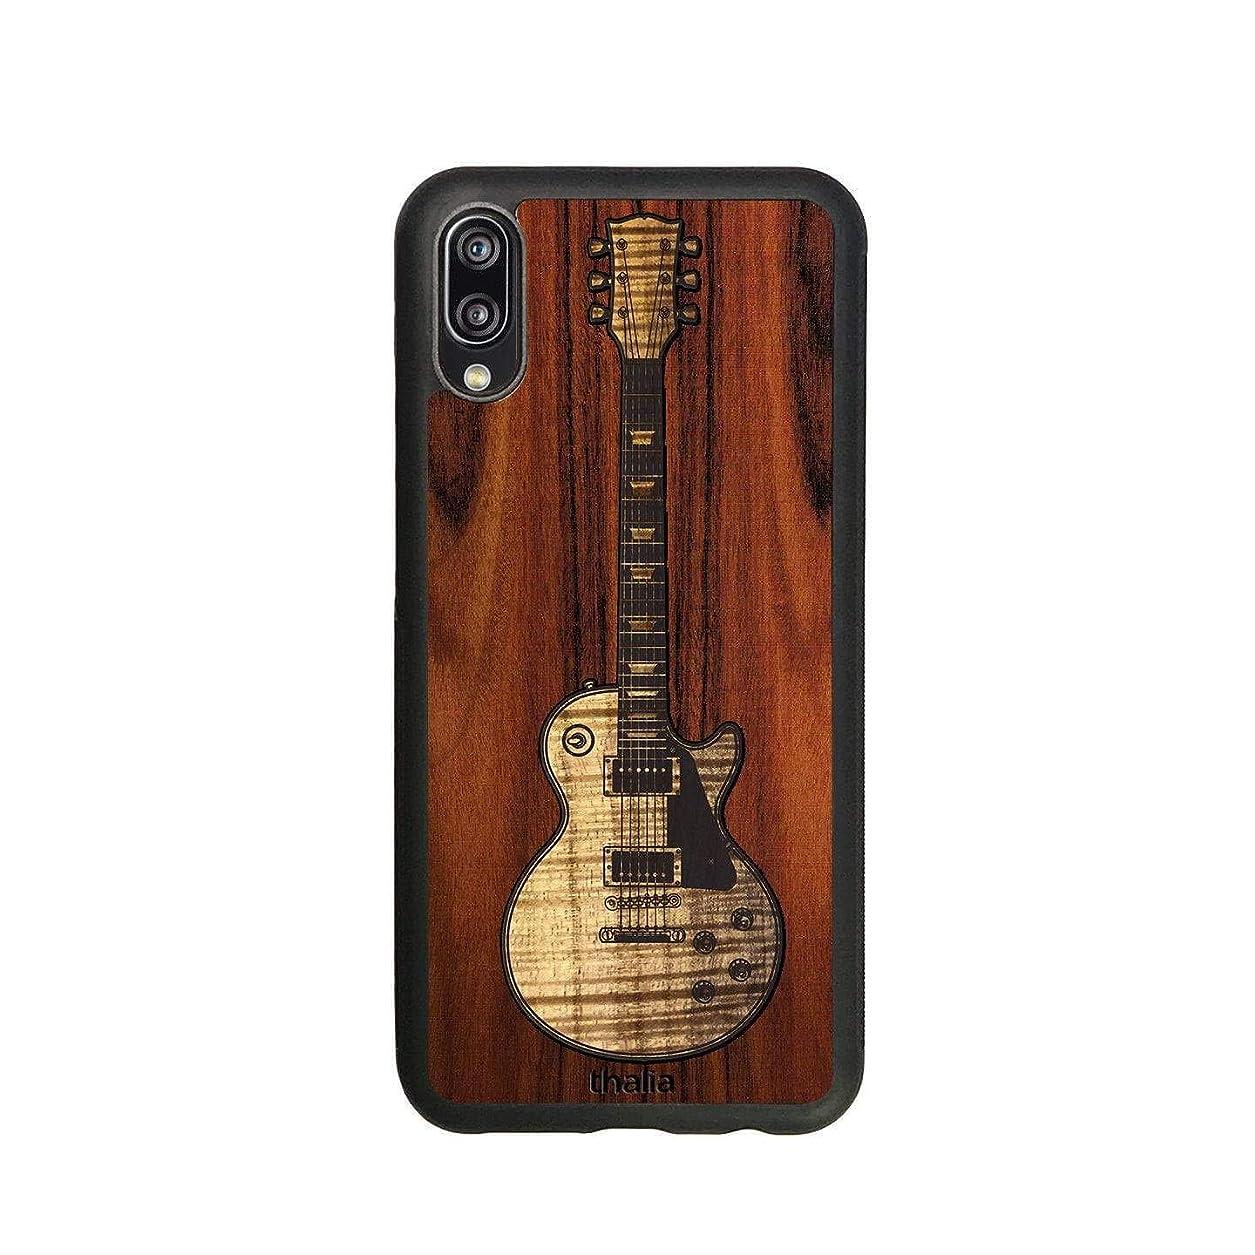 Santos Rosewood & Les Paul Hawaiian Koa Inlaid Guitar Phone Case | Thalia Exotic Wood Cases Huawei P20 Lite wbk12187611